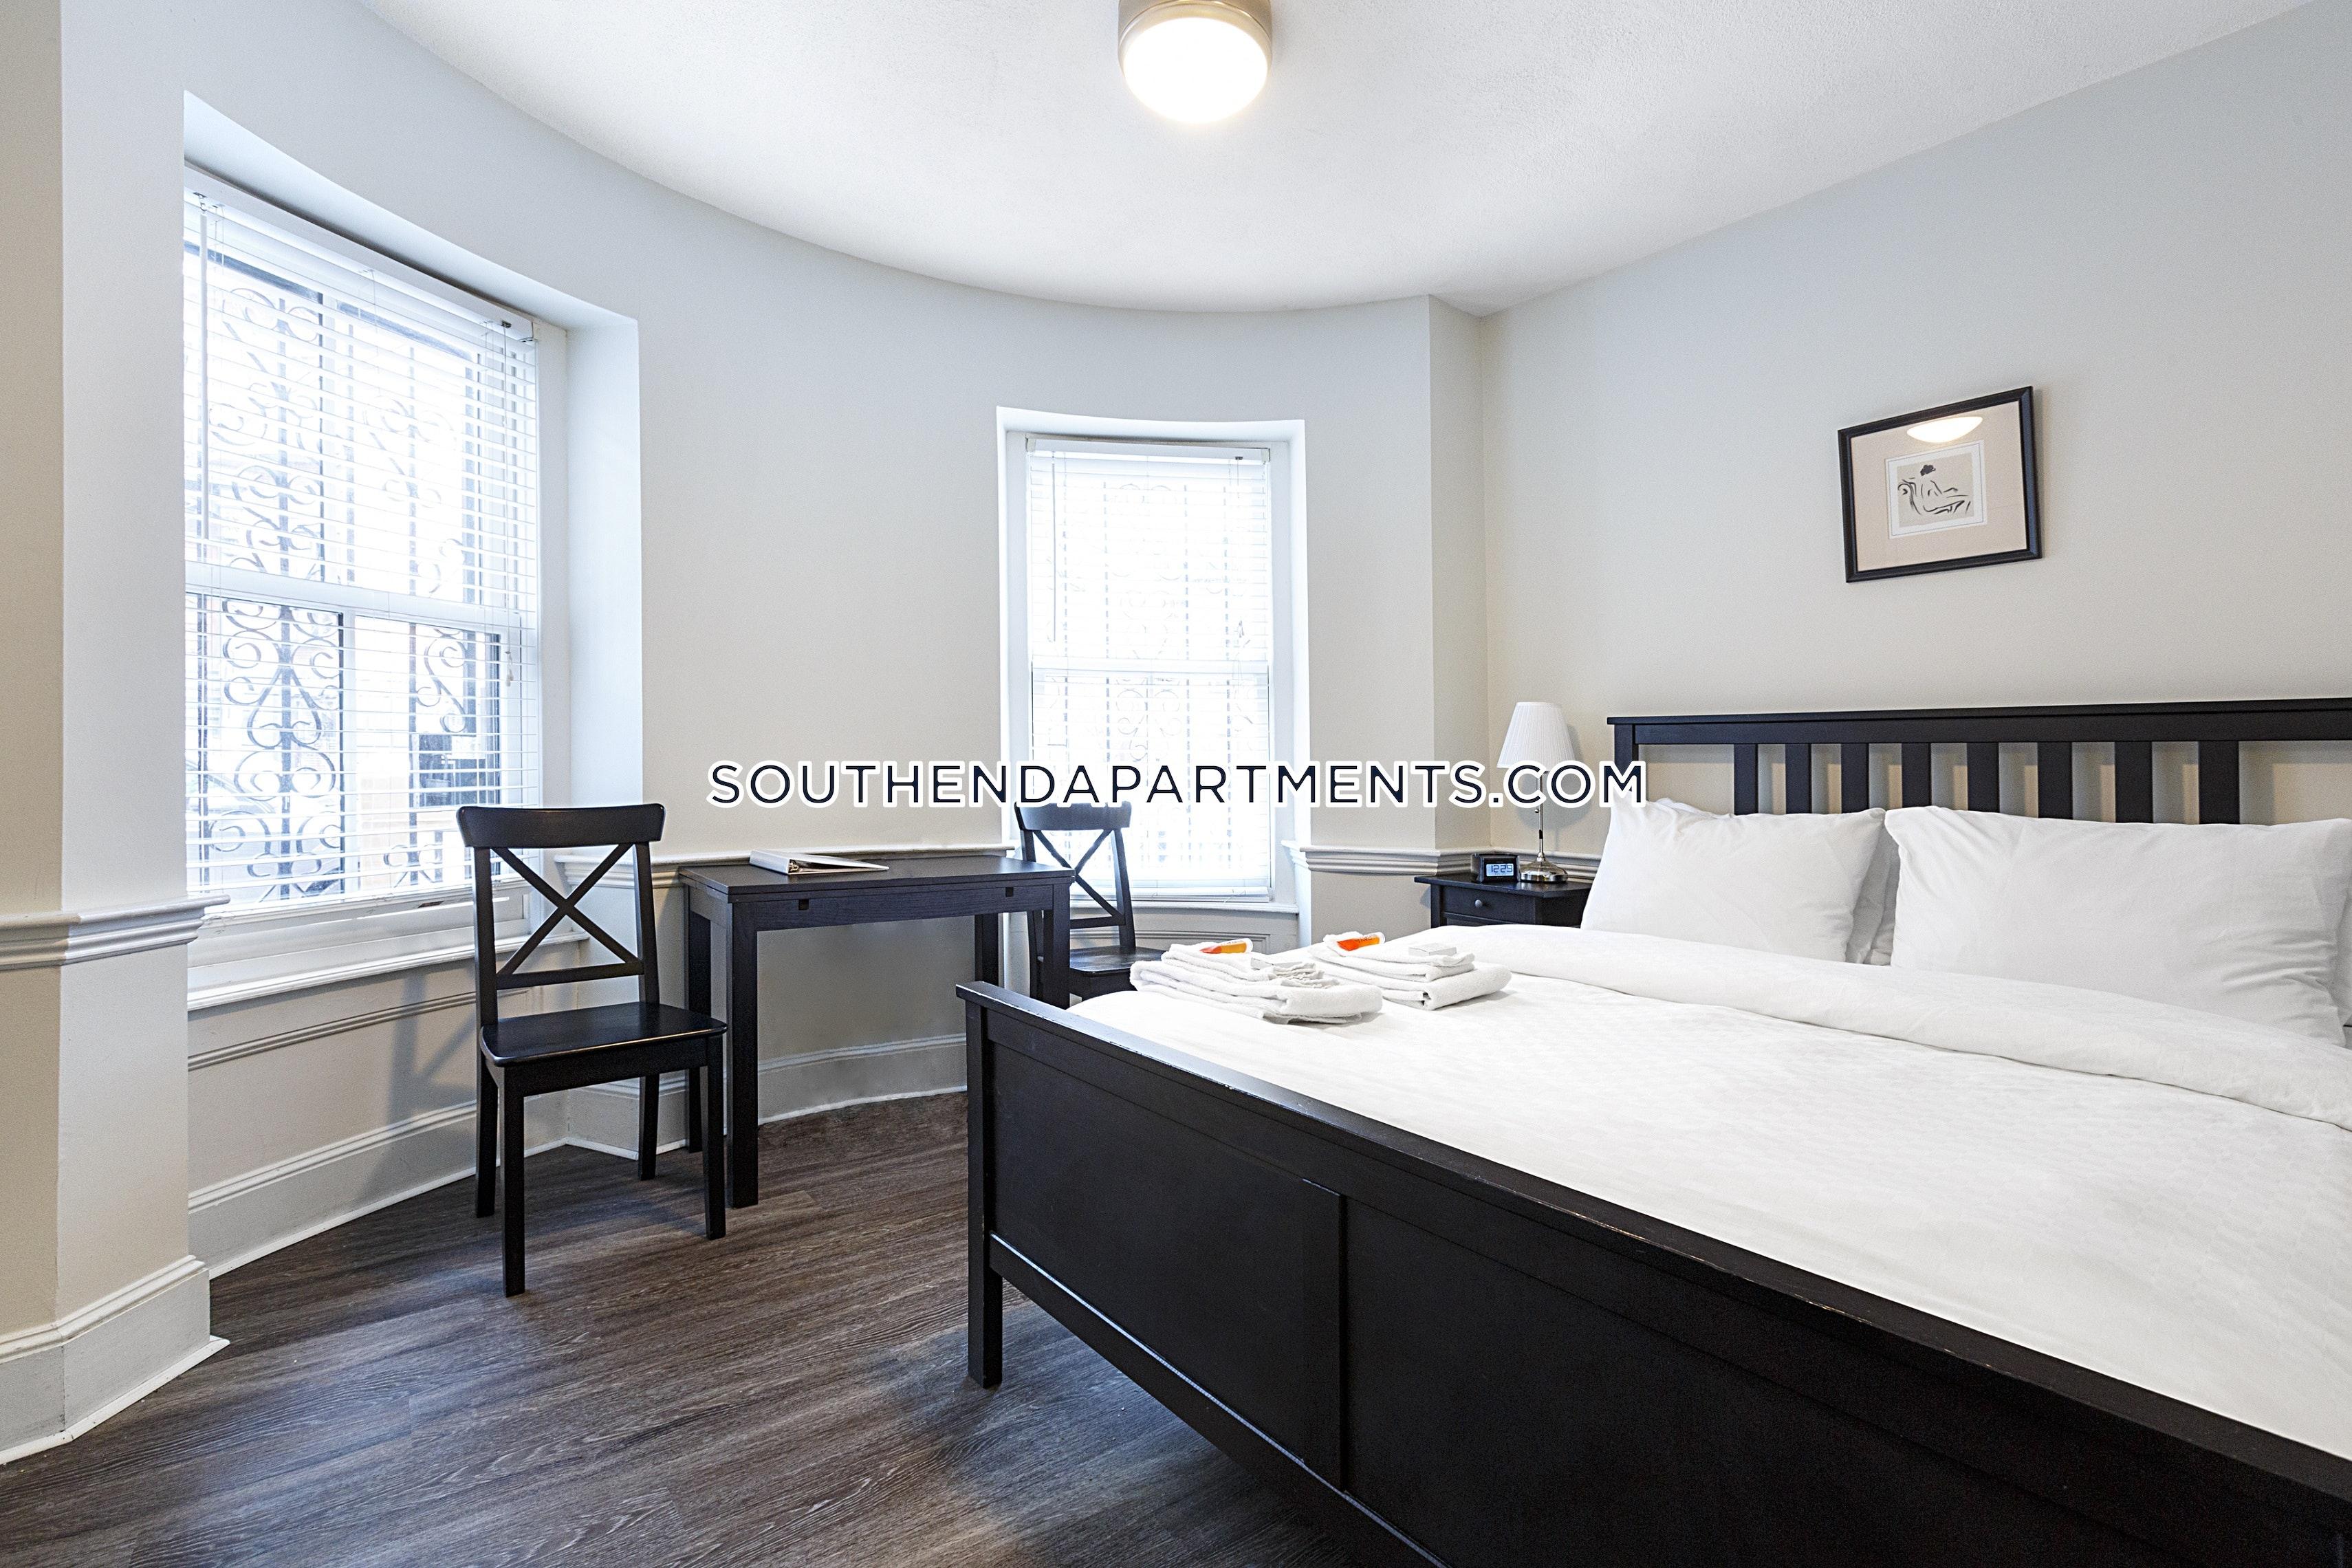 Single Listing South End Apartment For Rent Studio 1 Bath Boston 2 800